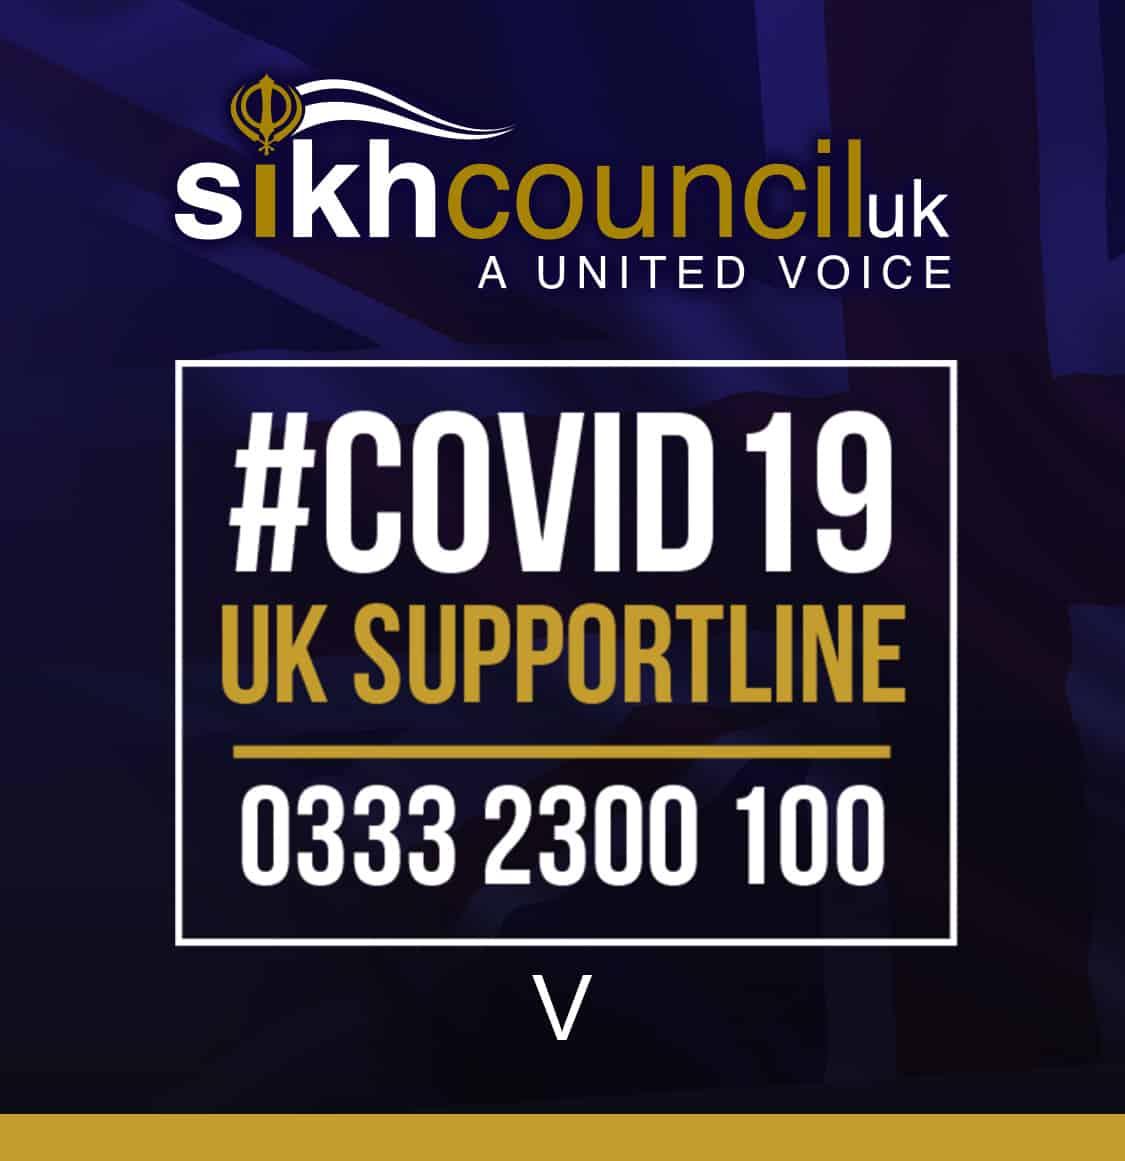 Sikh Council UK Corona Covid 19 Pandemic Support Line Uk